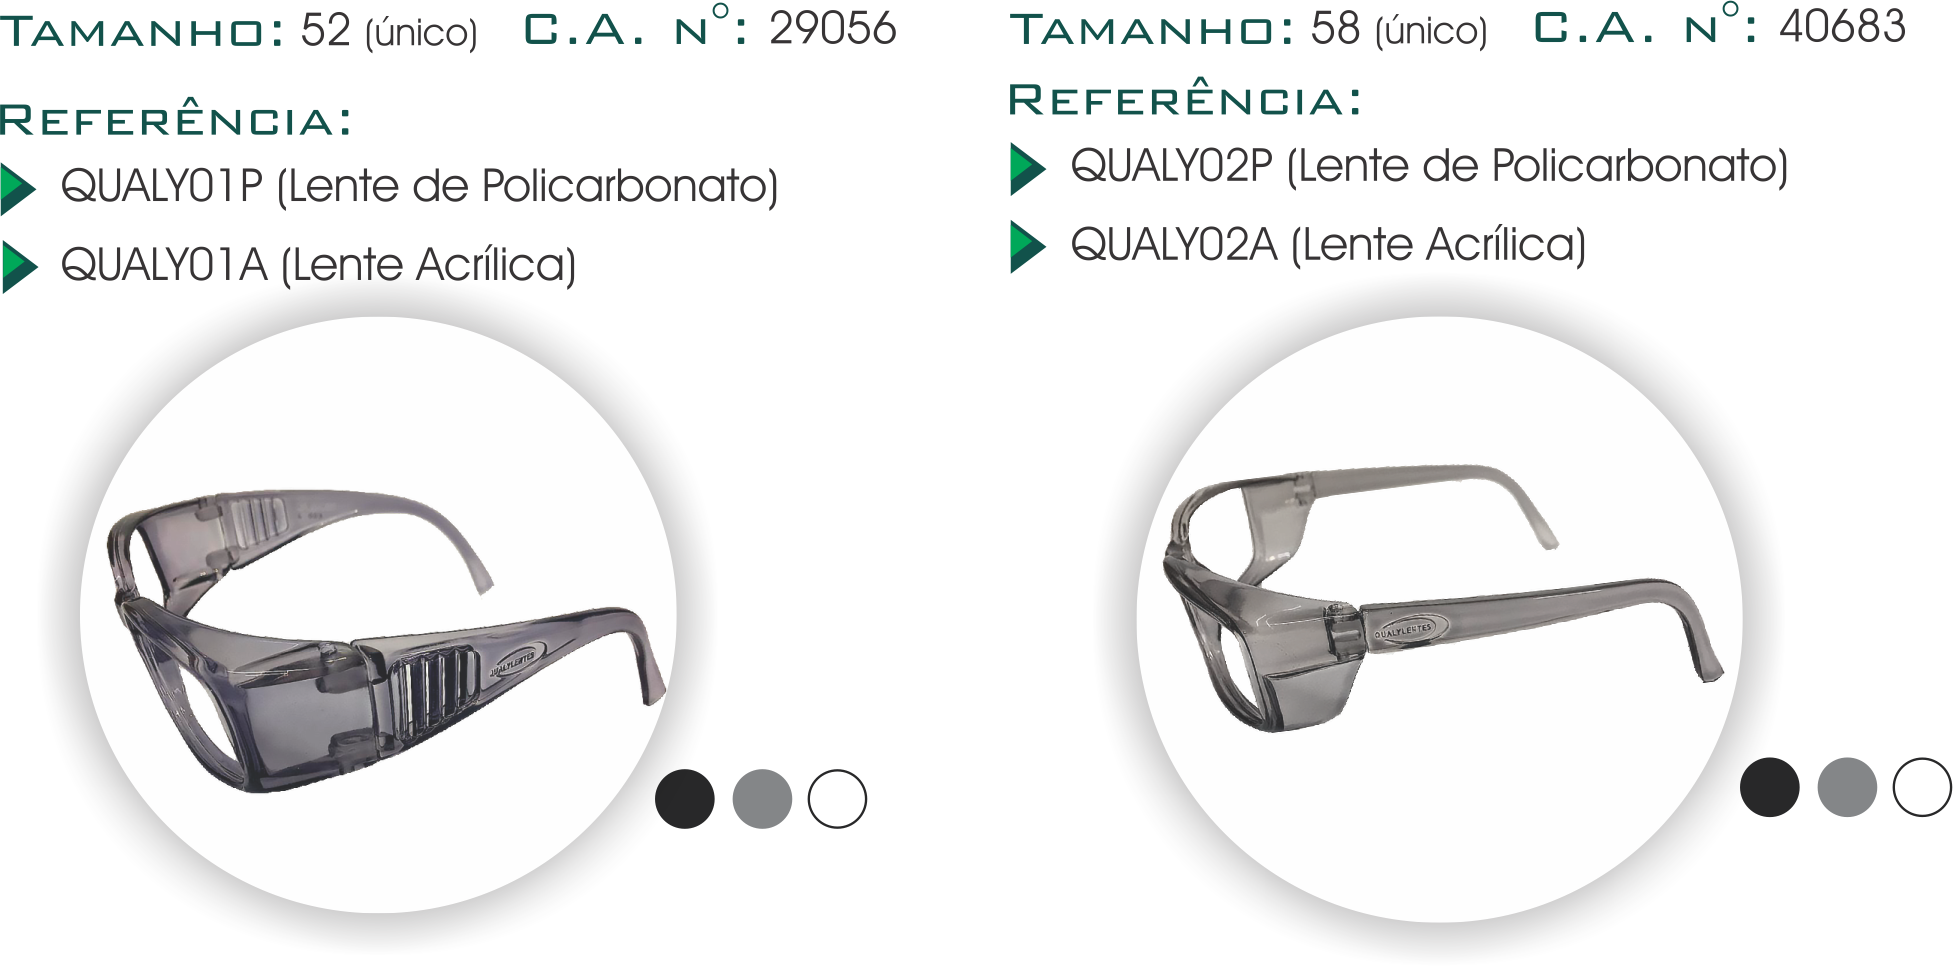 6ad0ebc990f91 Óculos de Segurança